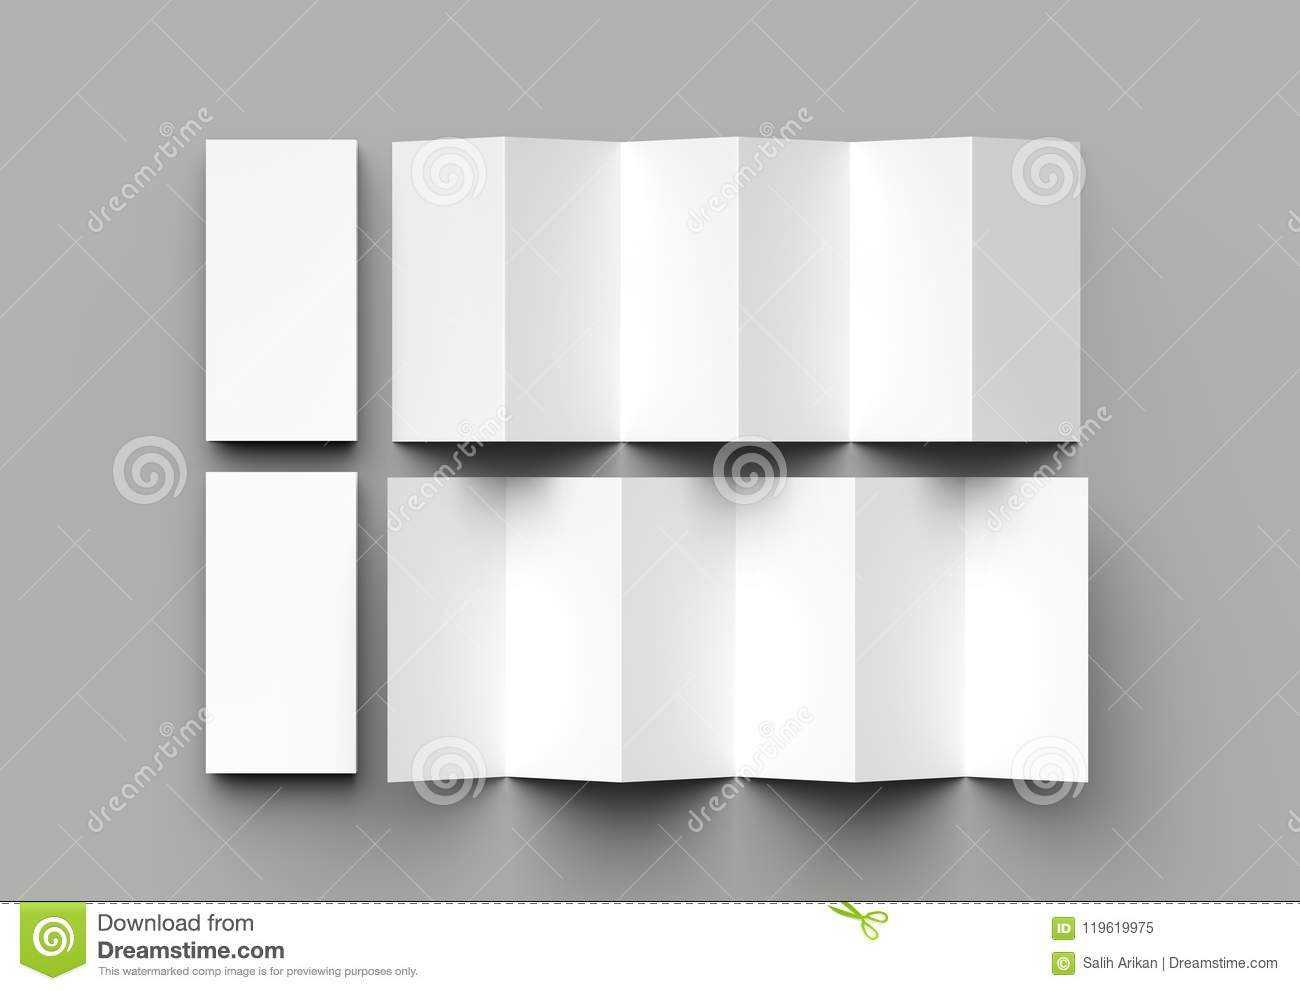 6 Panel Brochure Template - Karan.ald2014 In 6 Sided Brochure Template